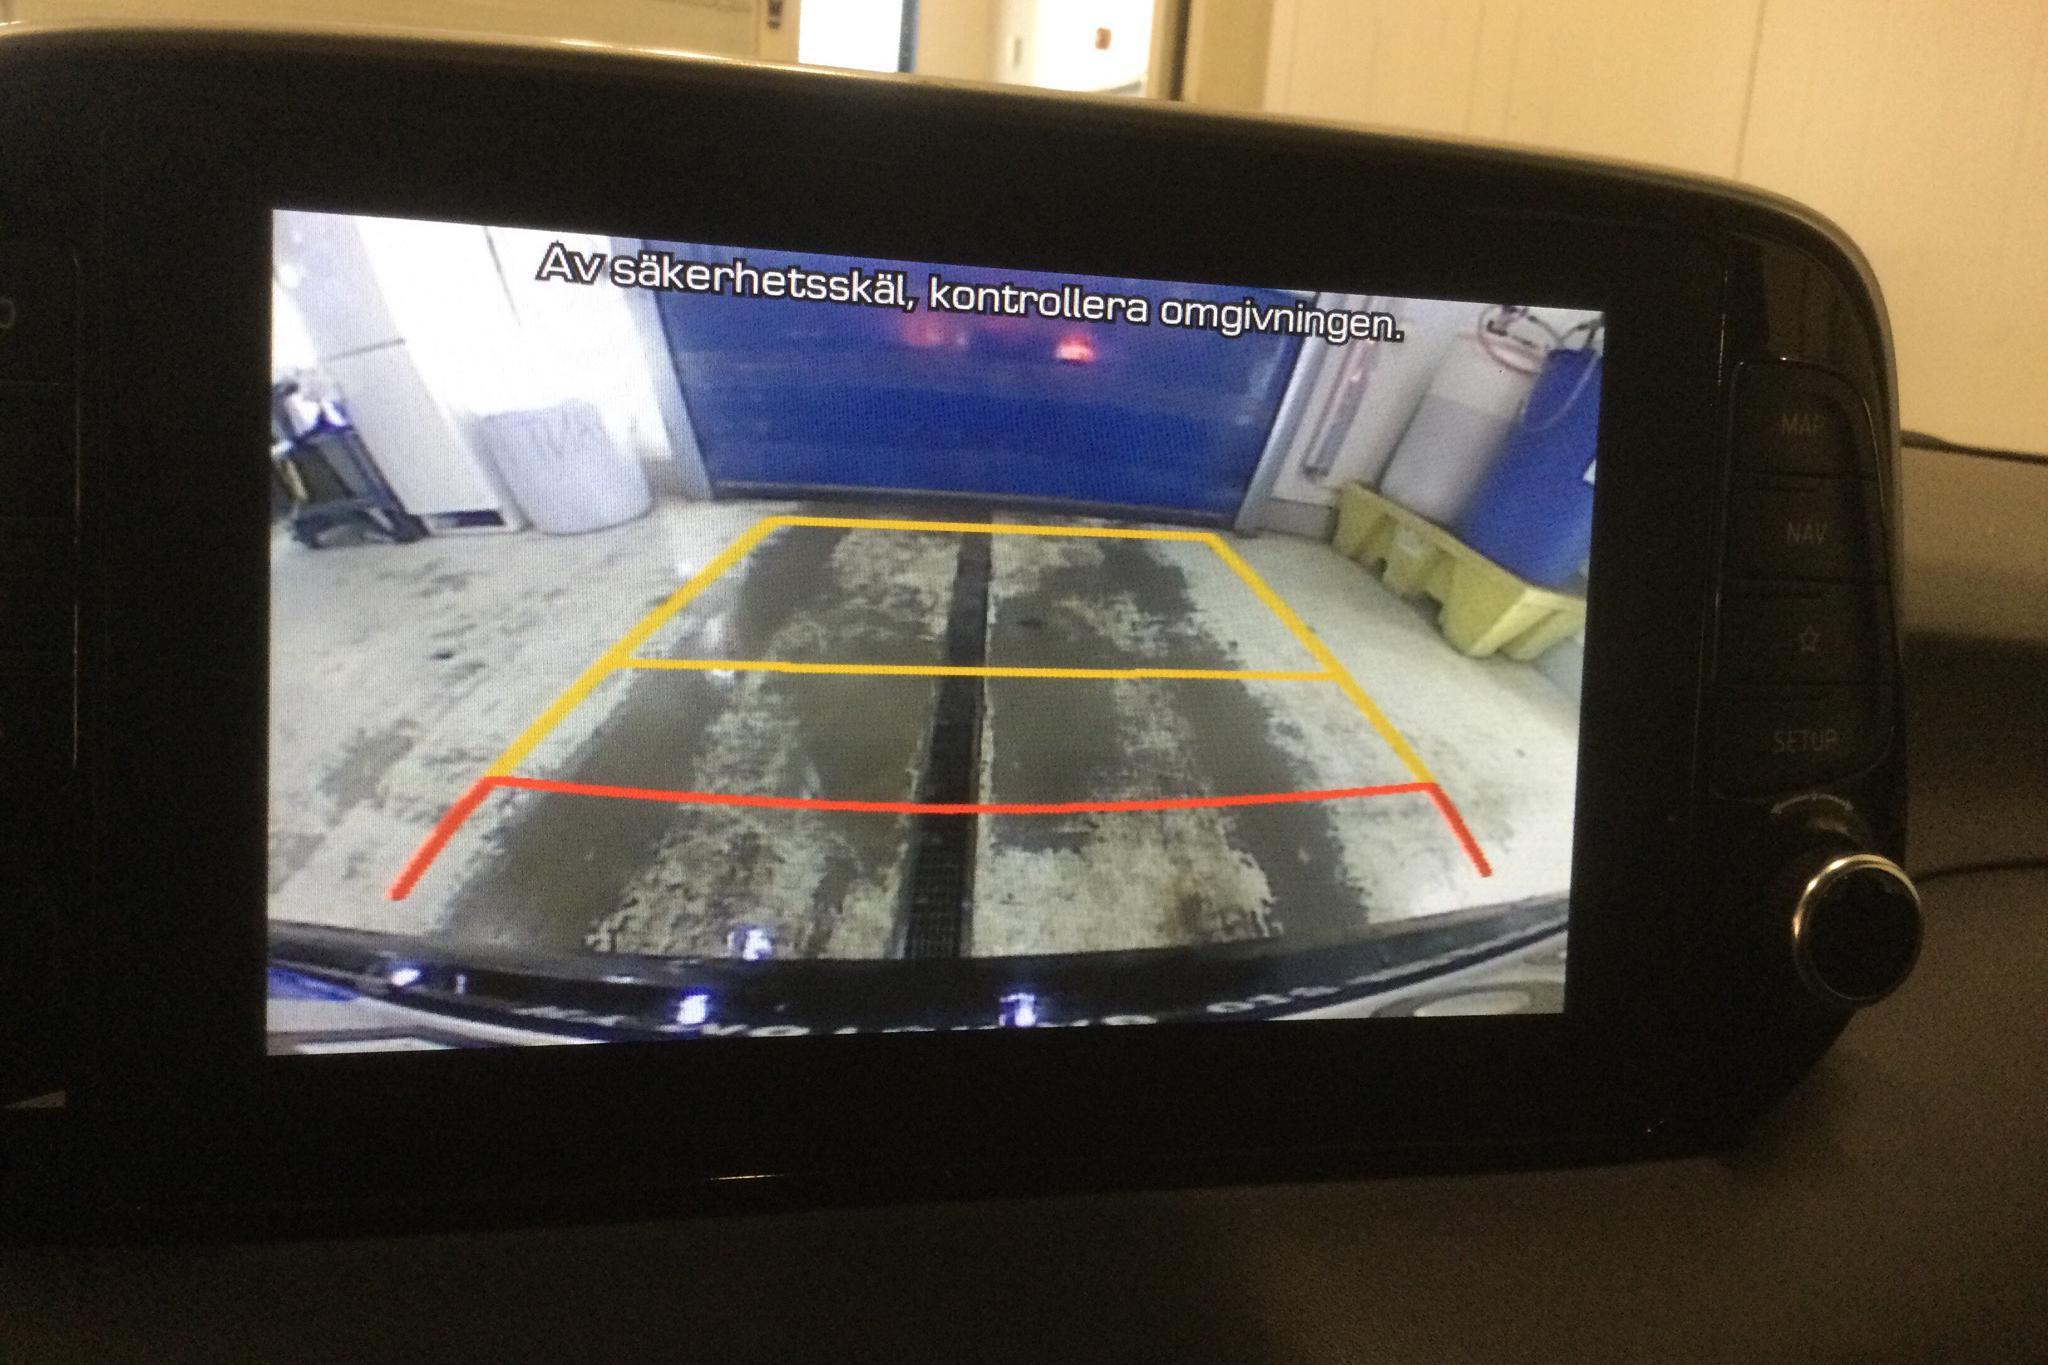 Hyundai Tucson 1.6 T-GDI 2WD (177hk) - 22 540 km - Automatic - black - 2019